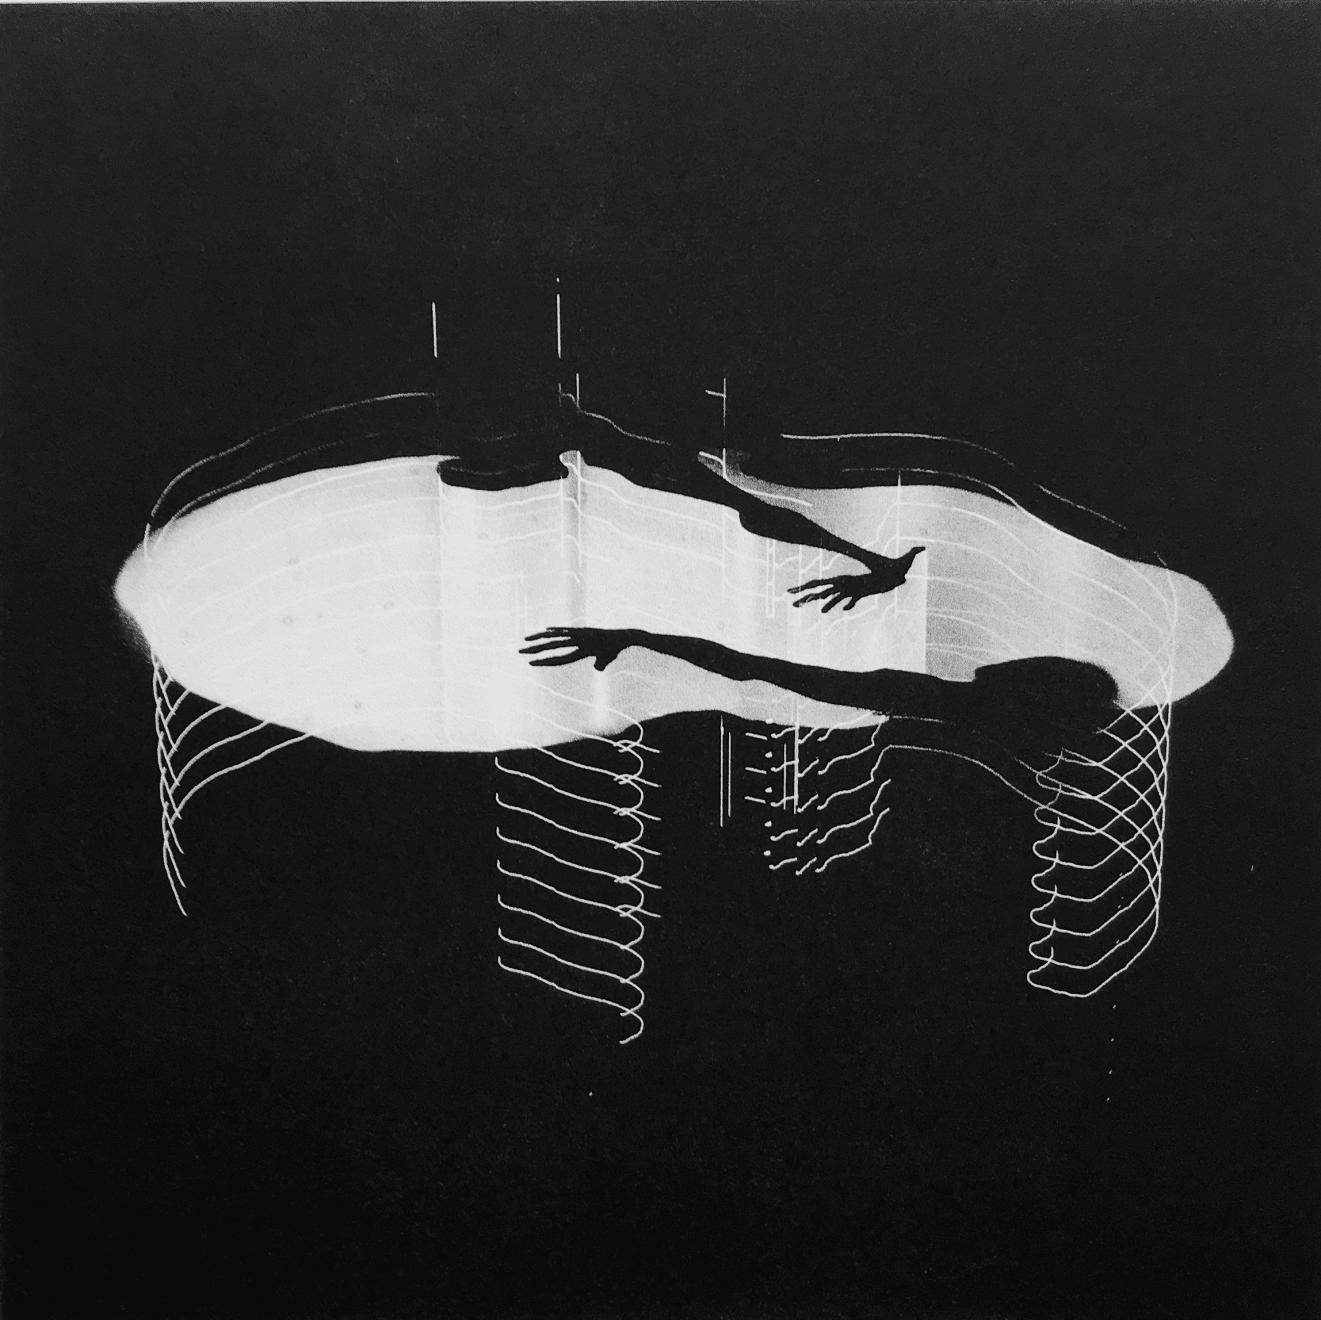 Veta Gorner, Rounded with a Sleep, 2020